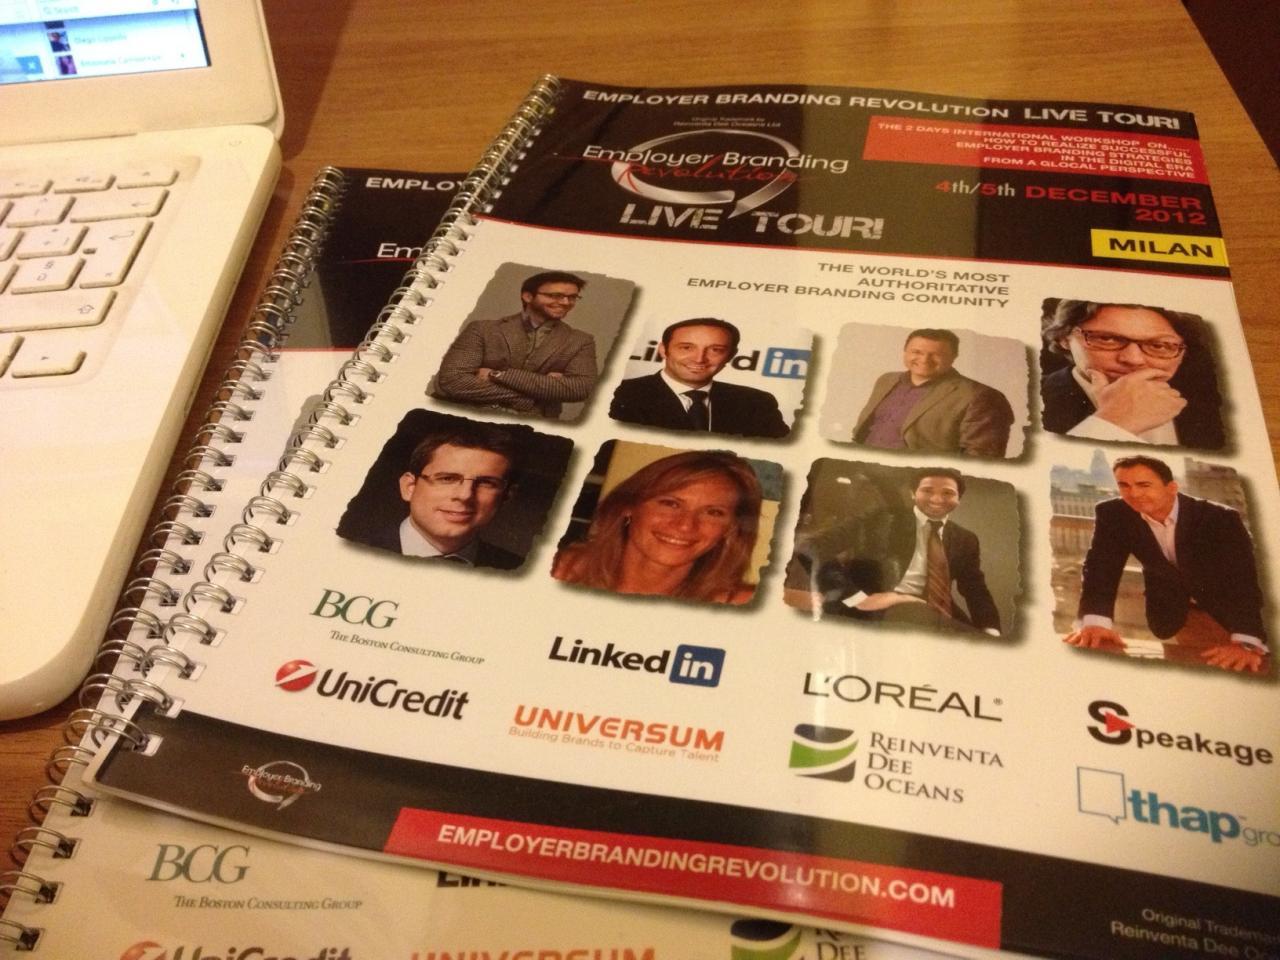 dbf46536 Employer Branding Books Brochures | Employer Branding Revolution